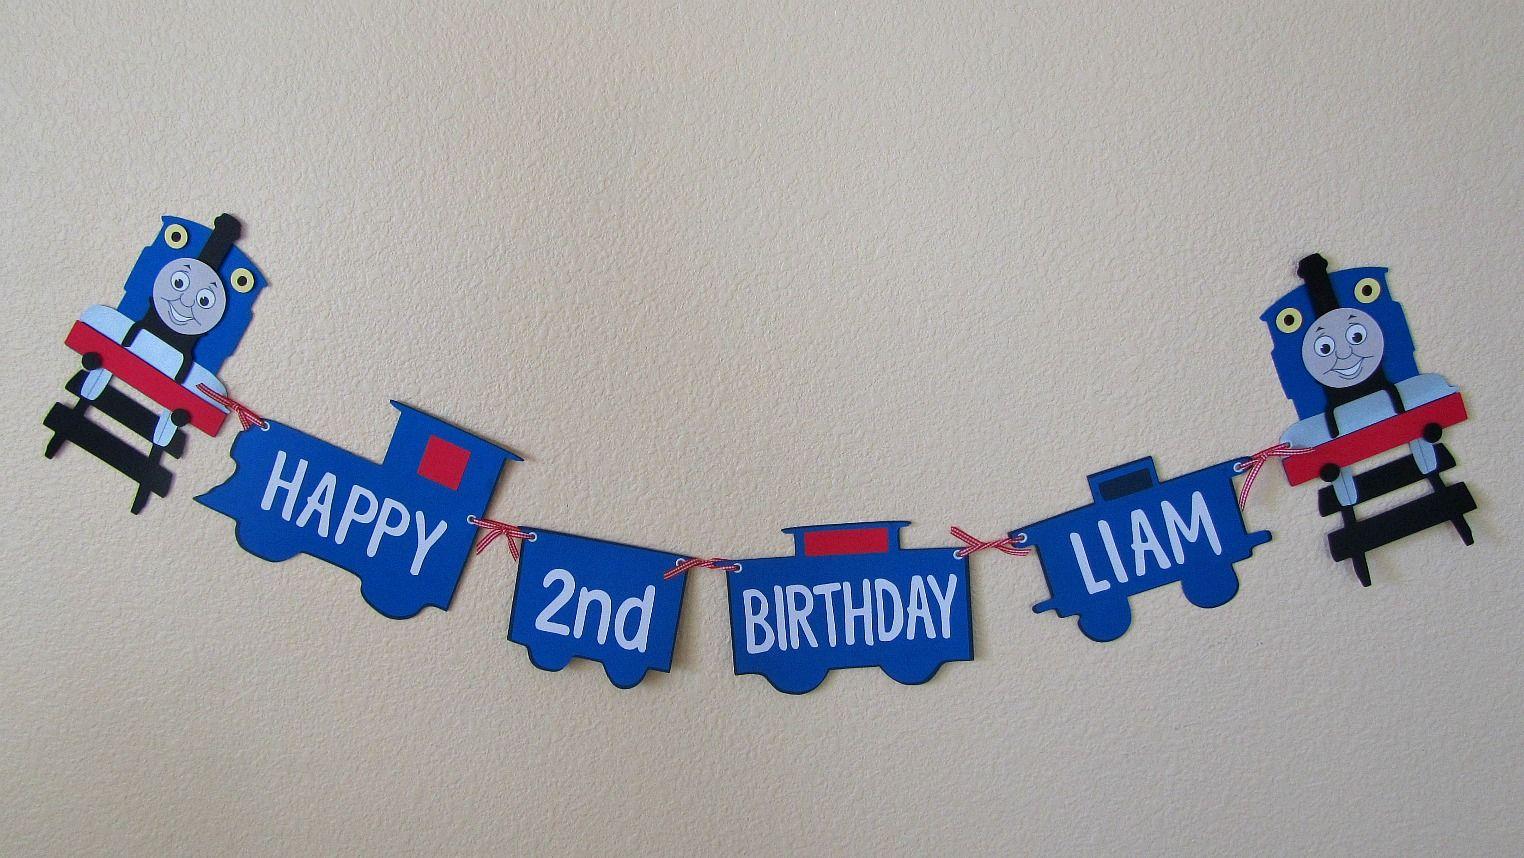 thomas the train invitations - Google Search | Birthday Party Ideas ...